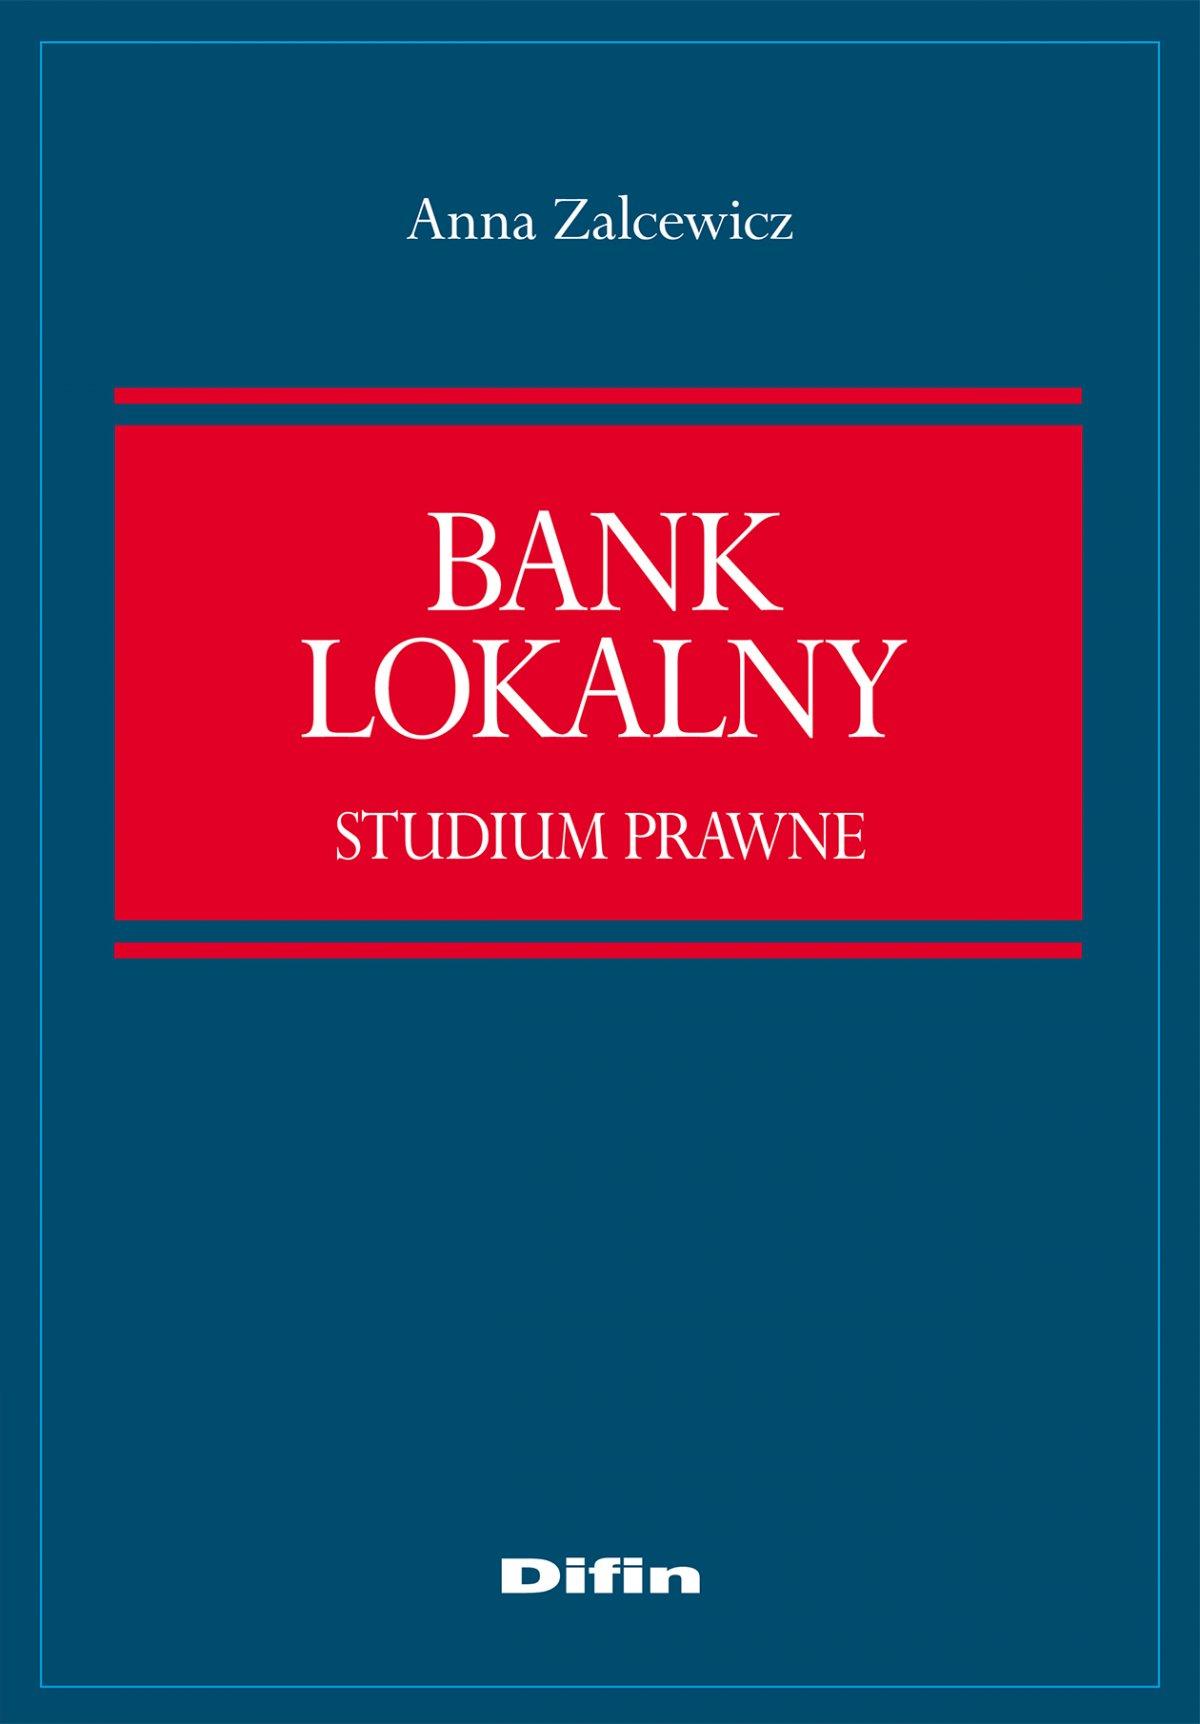 Bank lokalny Studium prawne